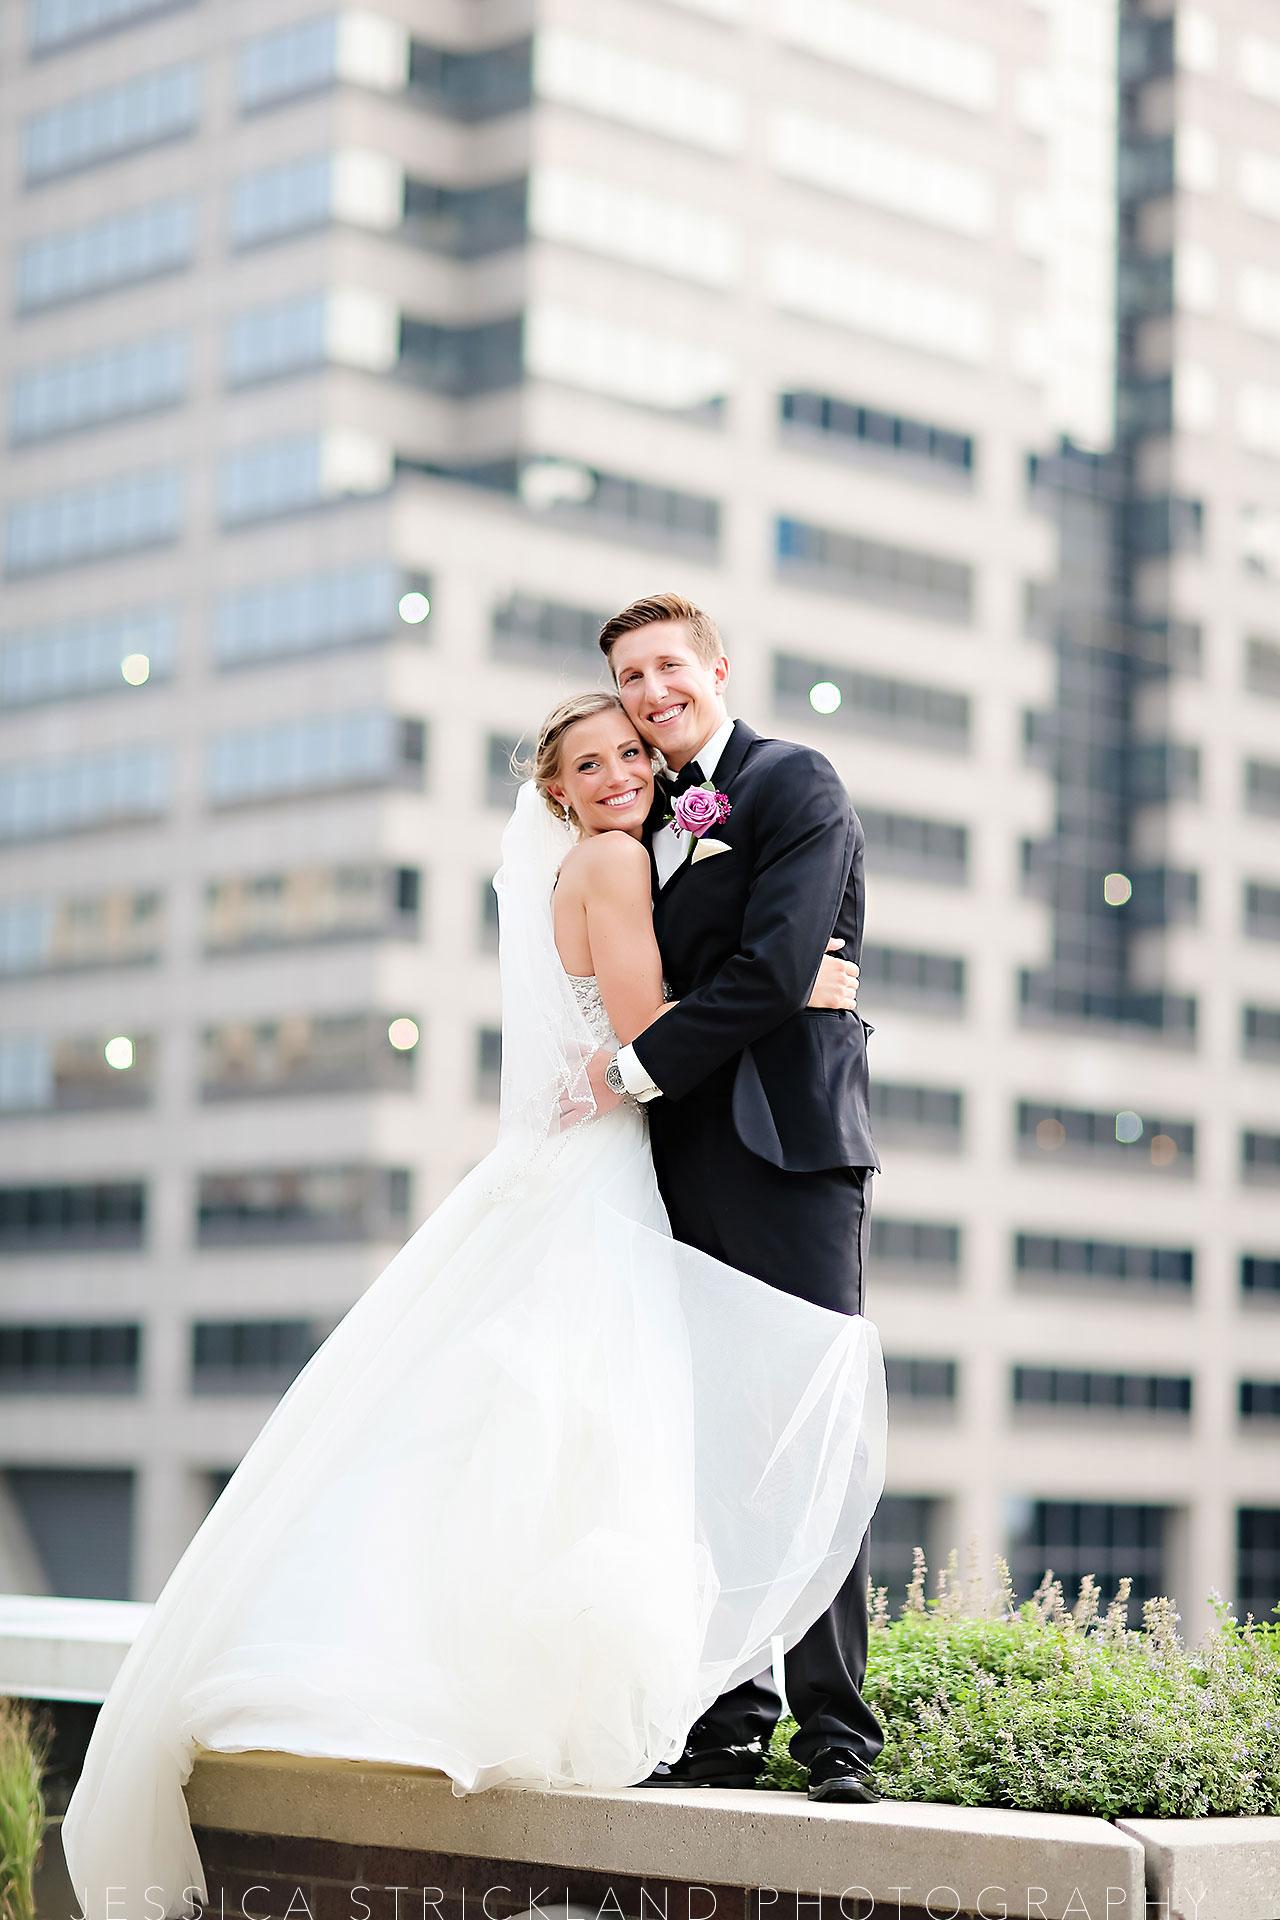 Serra Alex Regions Tower Indianapolis Wedding 267 watermarked